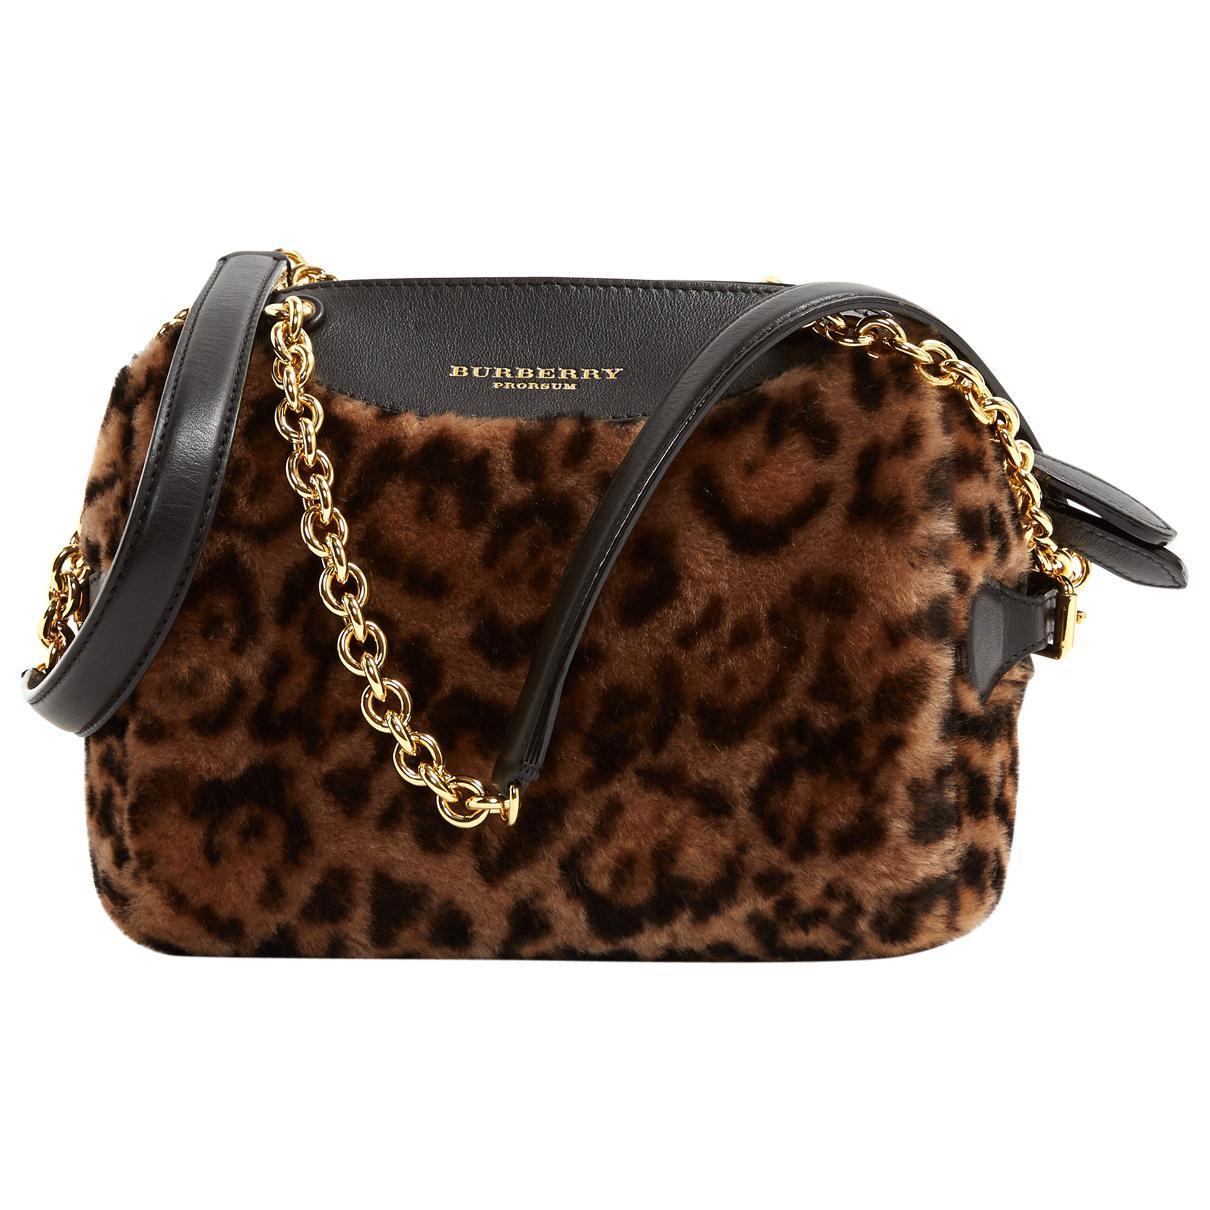 0f4ec541723e Burberry - Black Pony-style Calfskin Handbag - Lyst. View fullscreen